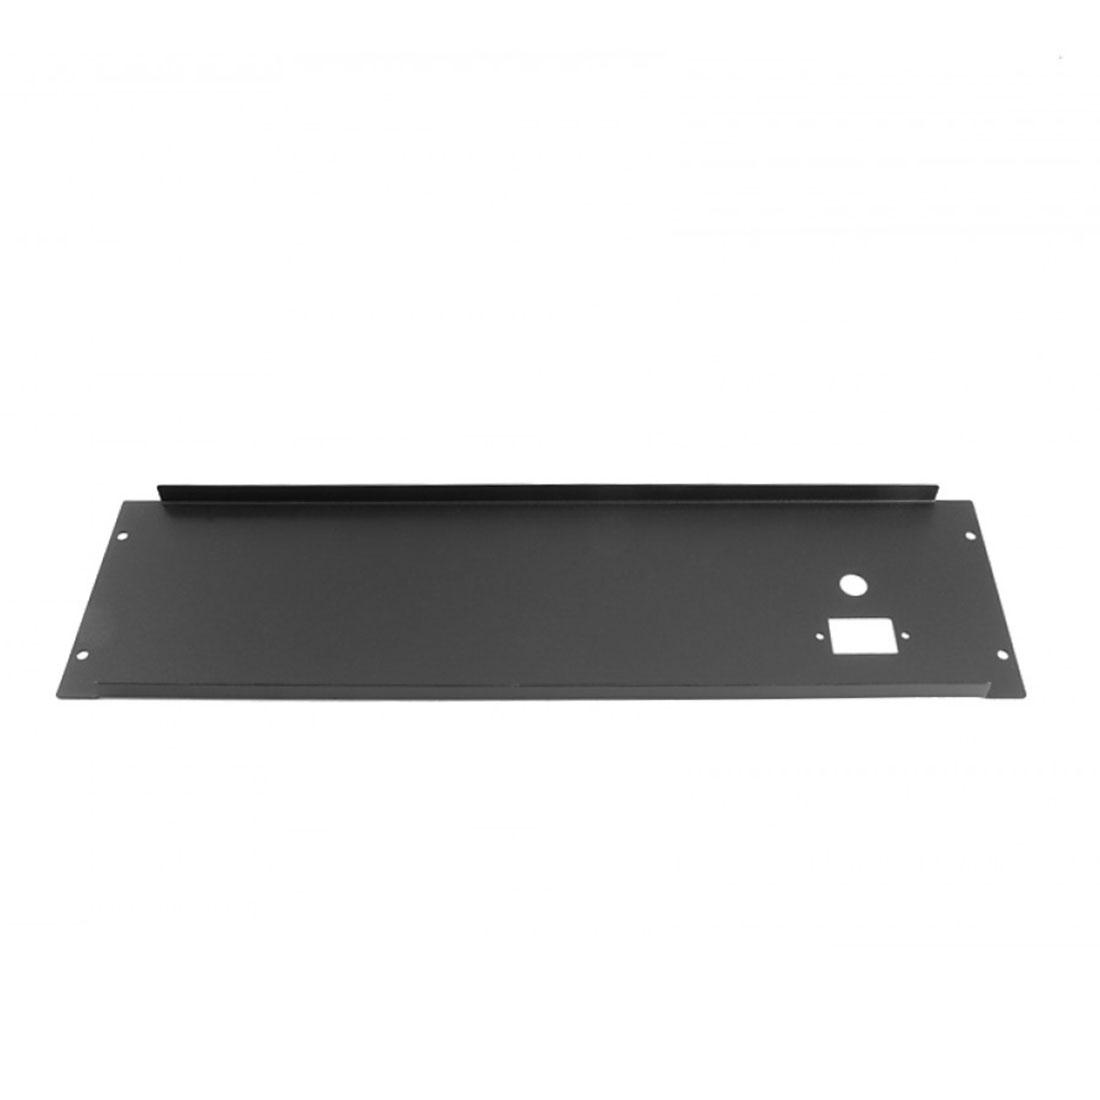 1PS03PN - 3U rack krabice plechová, 300mm, 4mm - rack panel černý